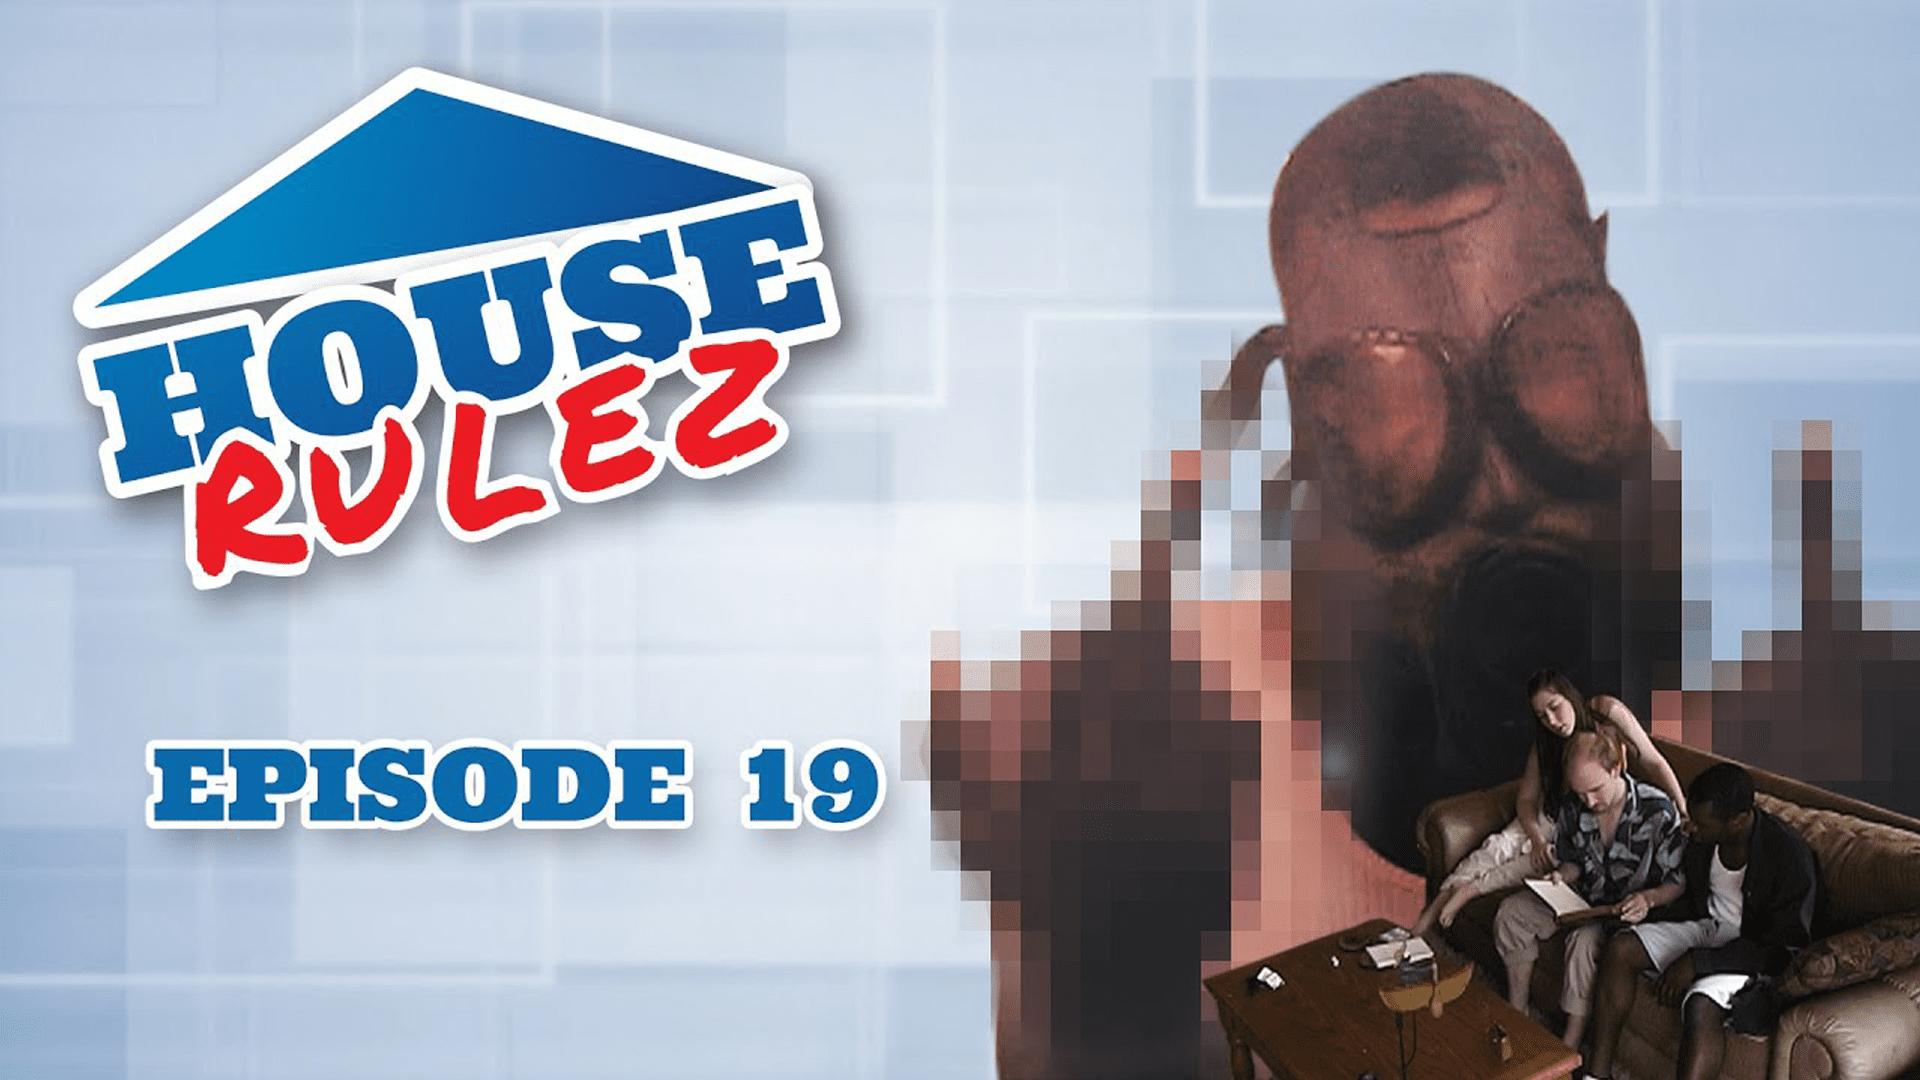 House Rulez Episode 19